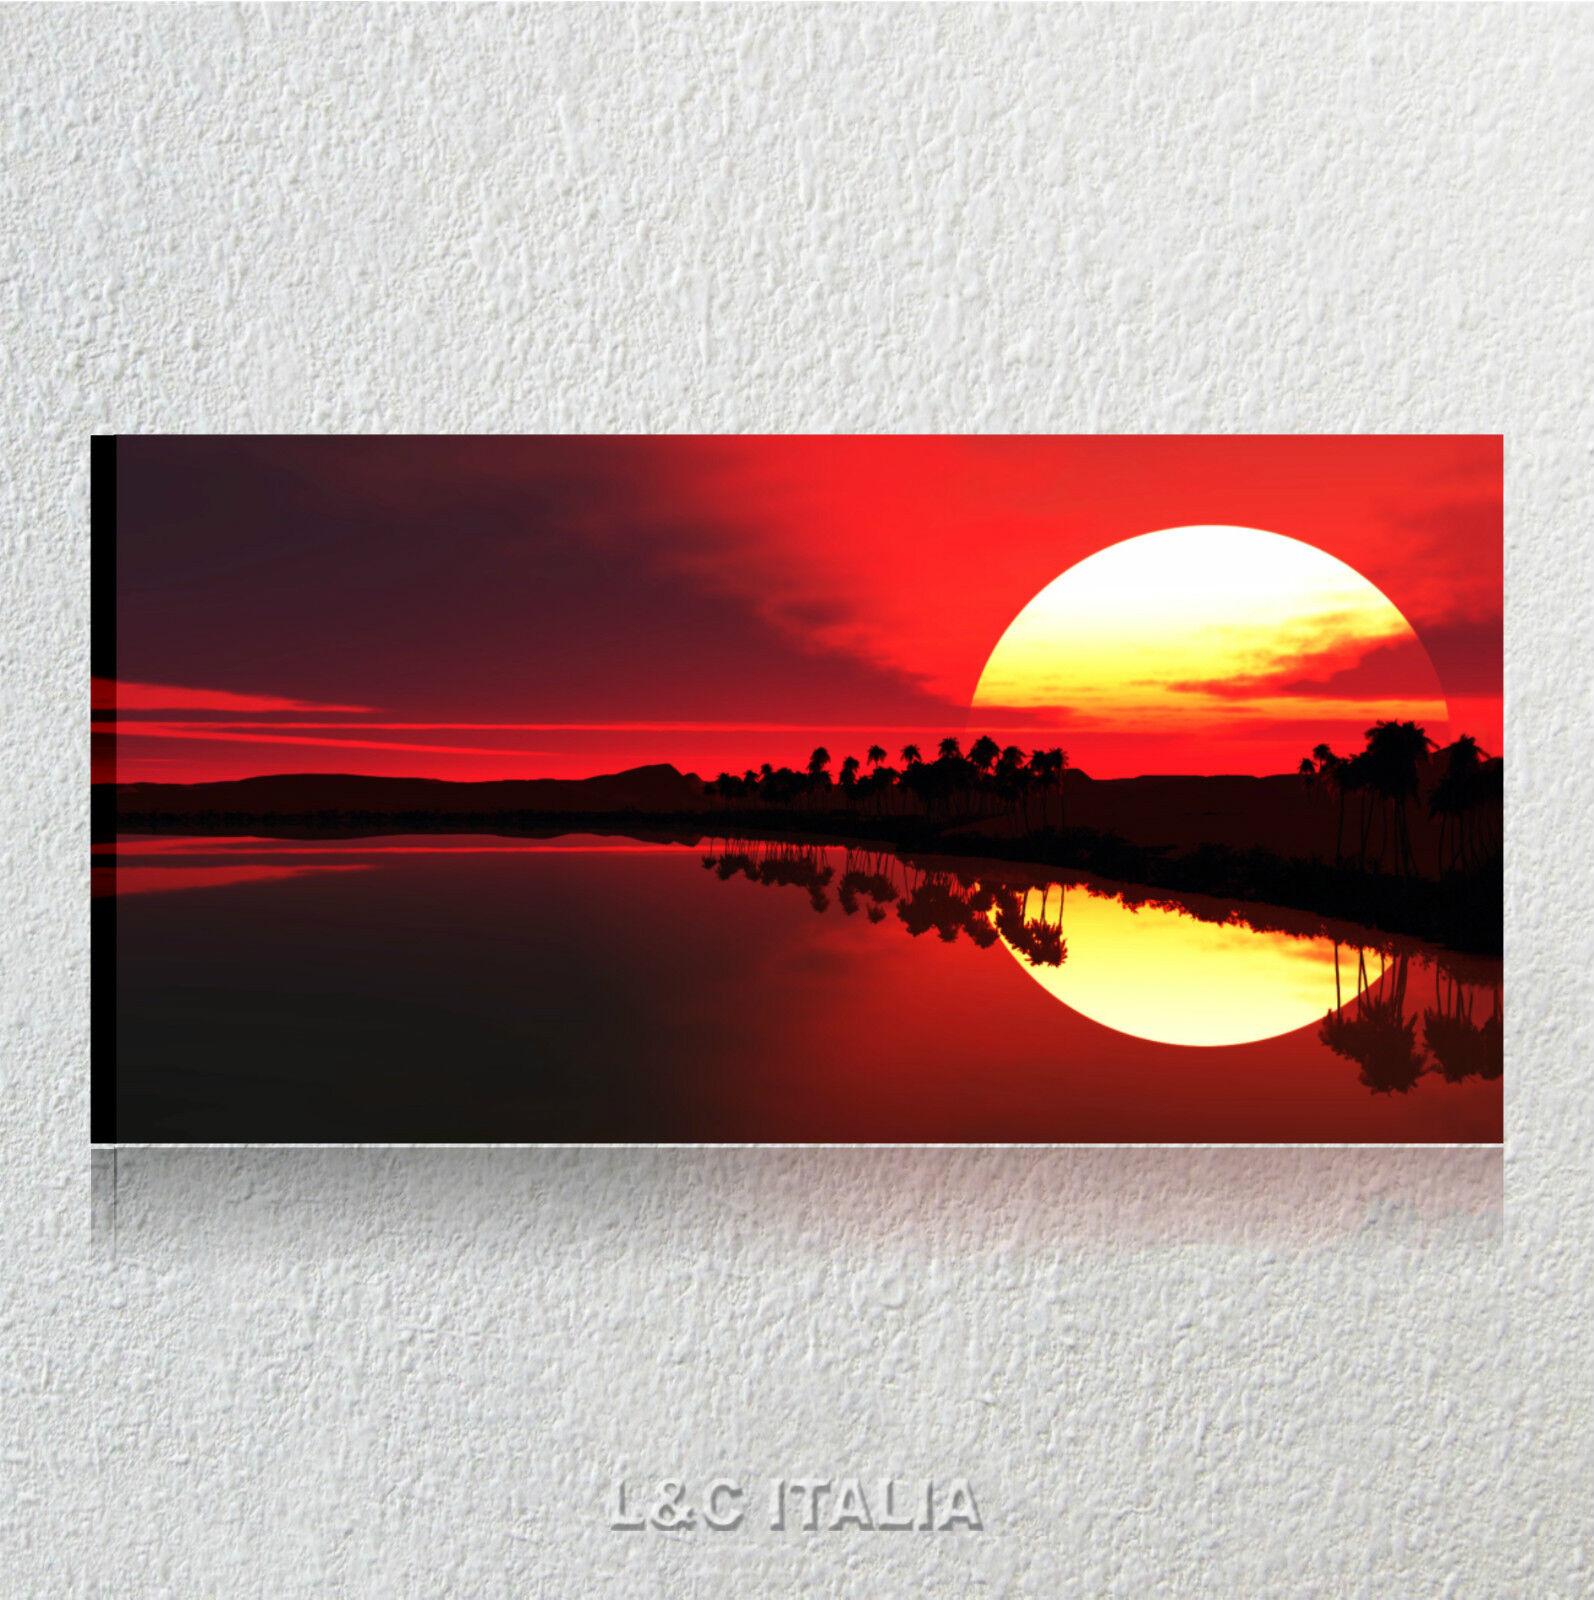 Alba rossa QUADRI MODERNI 90x45 ARrotAMENTO QUADRO PALME PAESAGGI MARE SUNSET